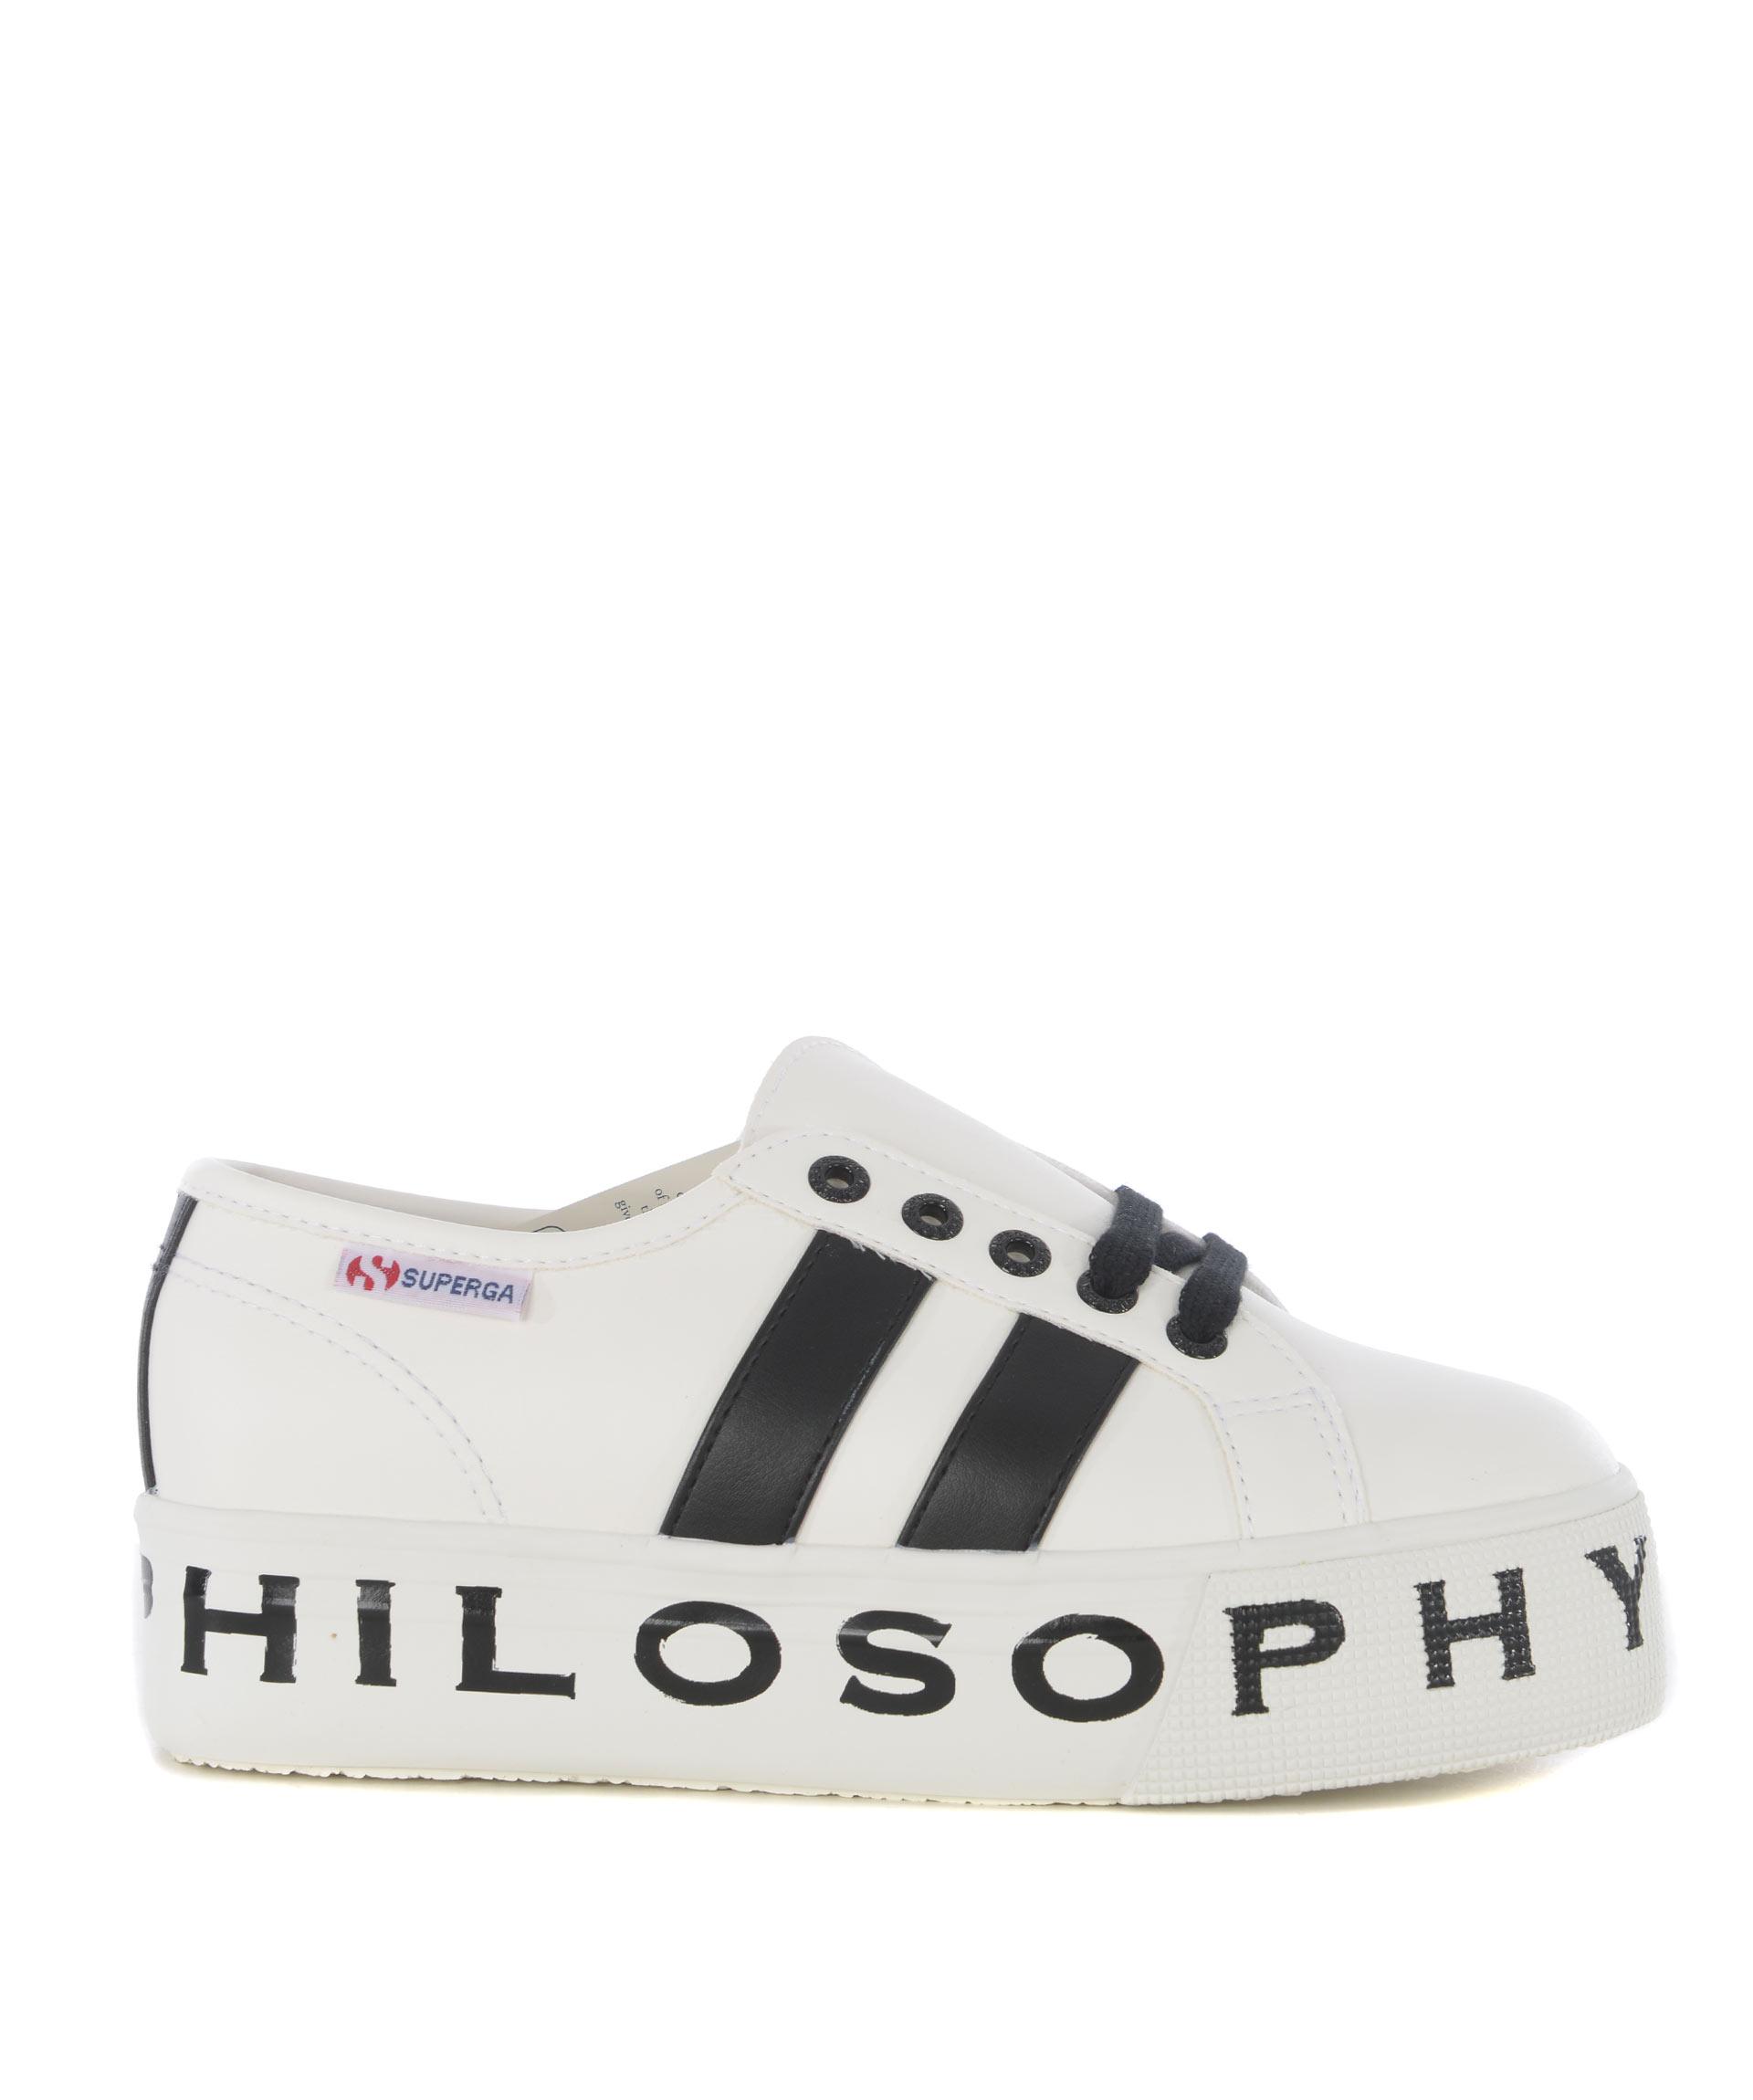 Philosophy Donna Sneakers Superga X Lorenzo Serafini Di 8nmwN0